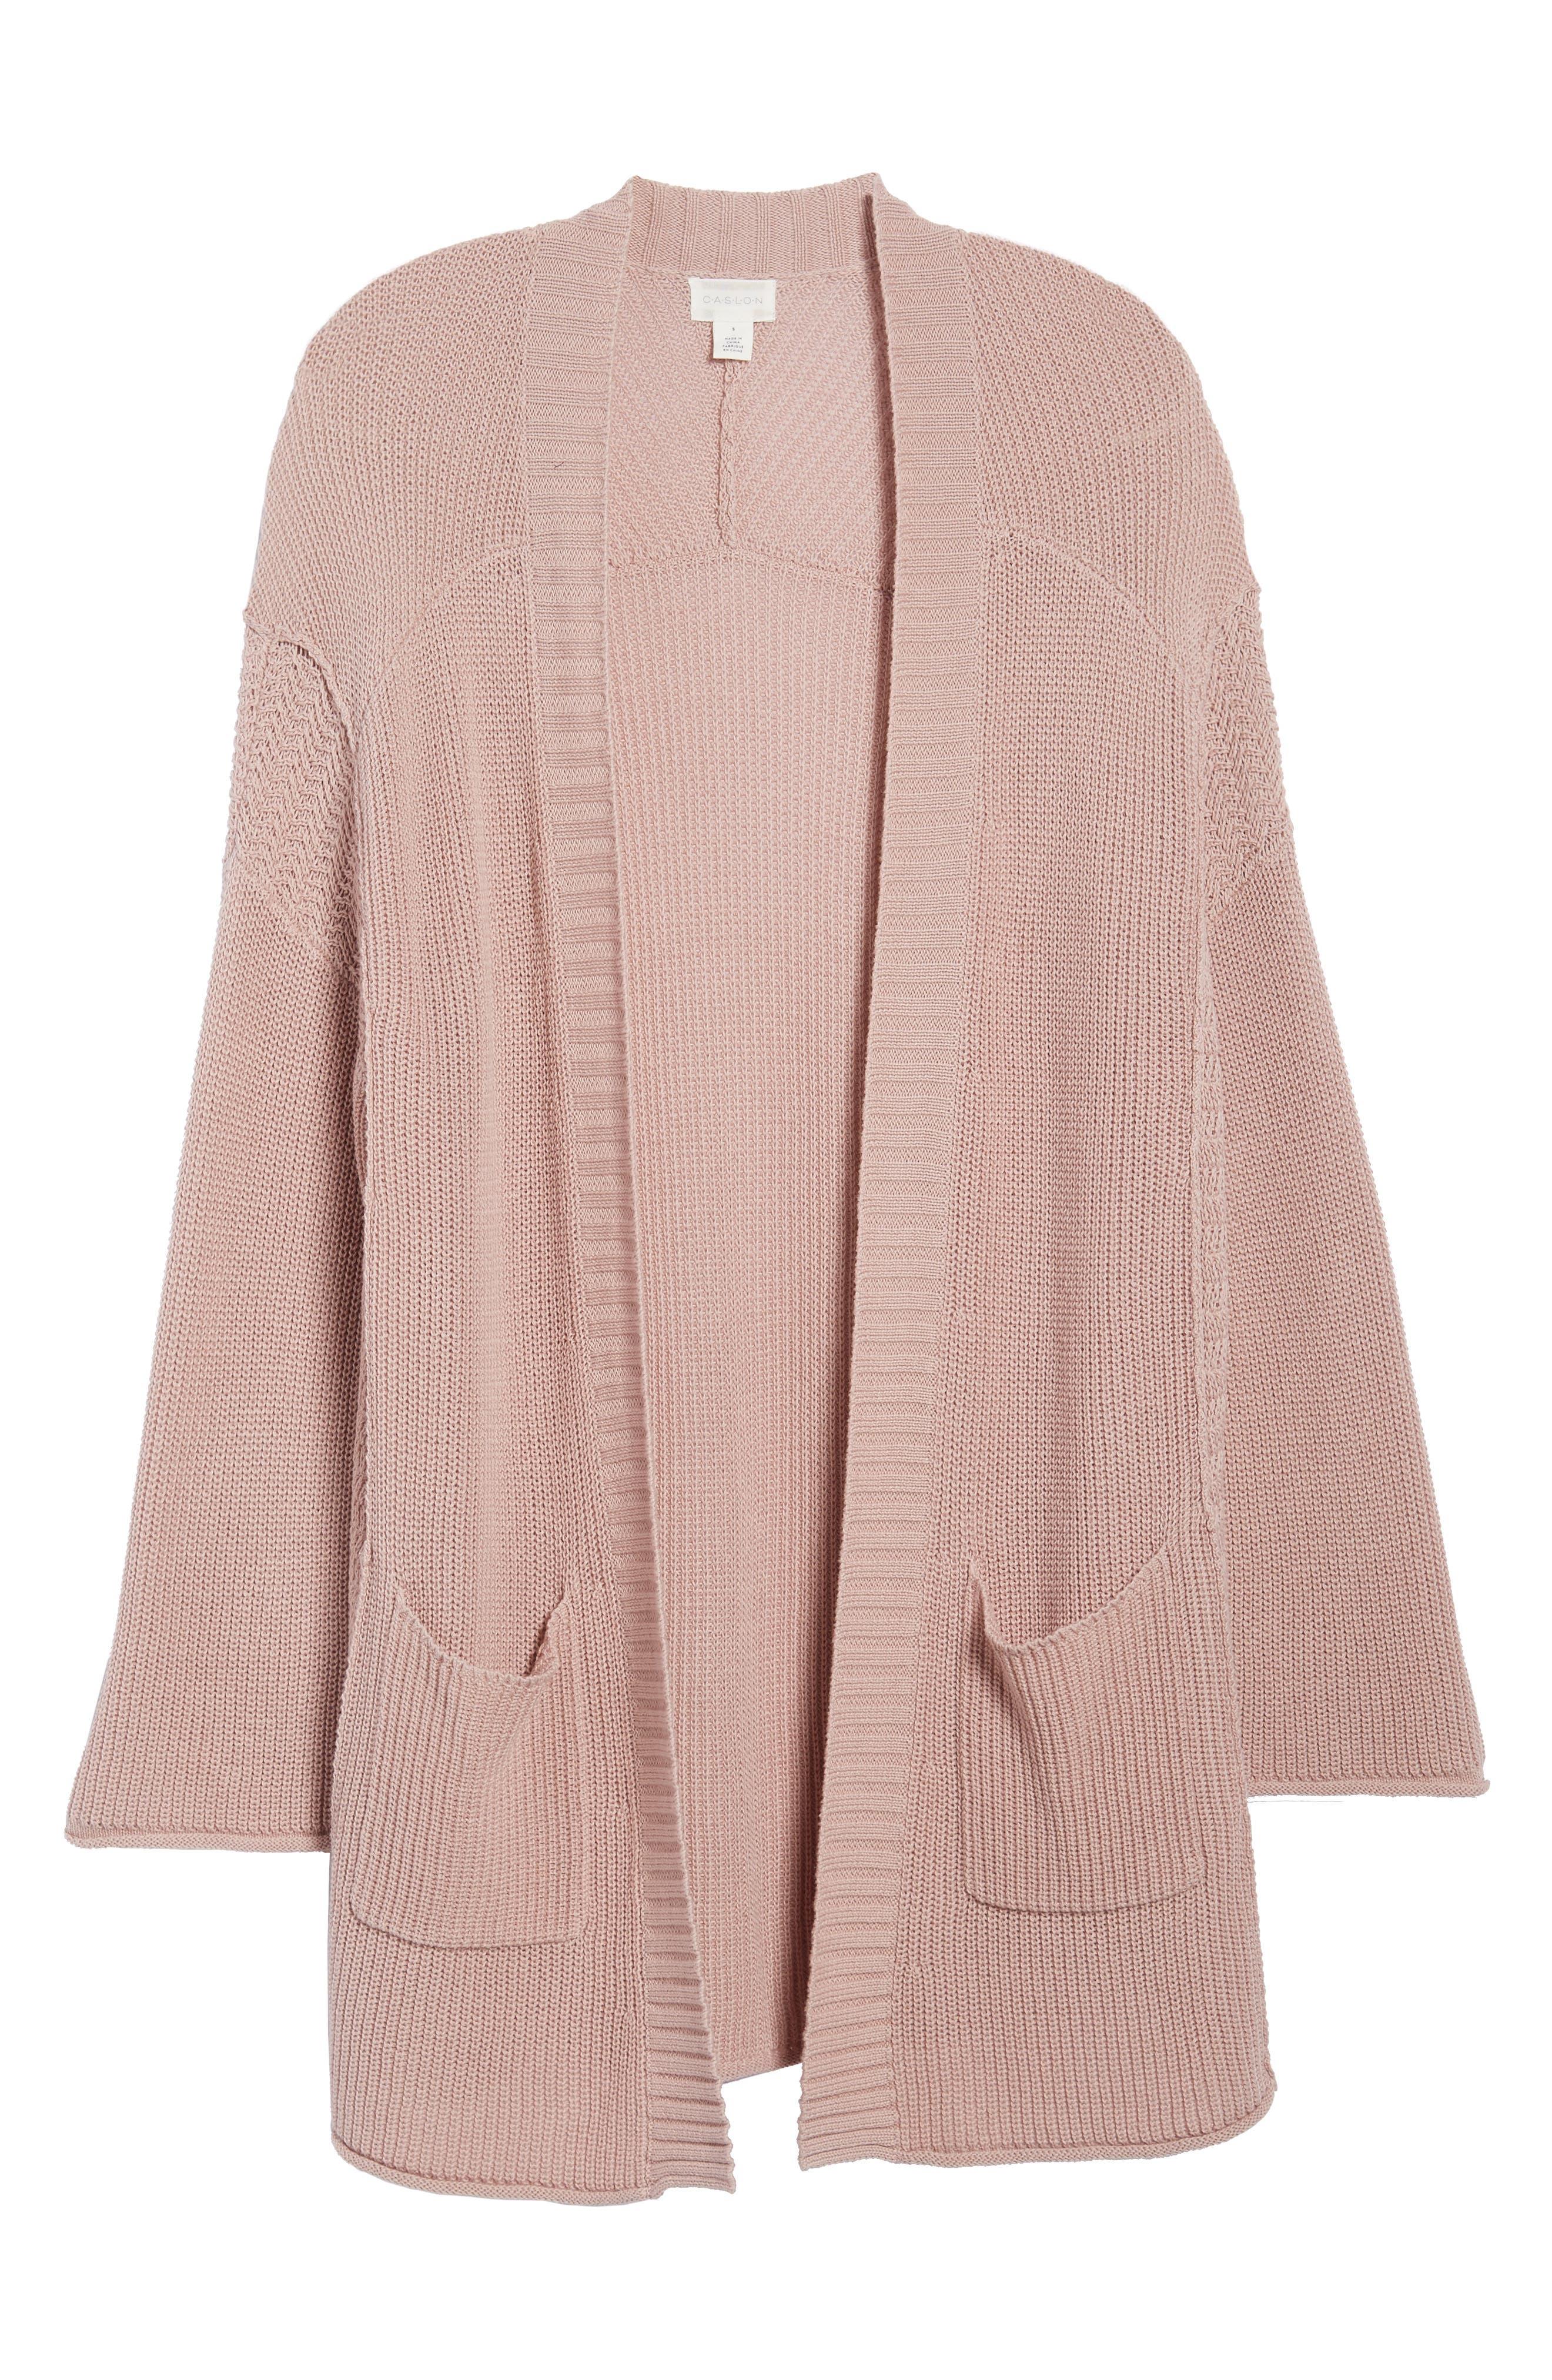 Open Cotton Cardigan,                             Alternate thumbnail 6, color,                             Pink Adobe